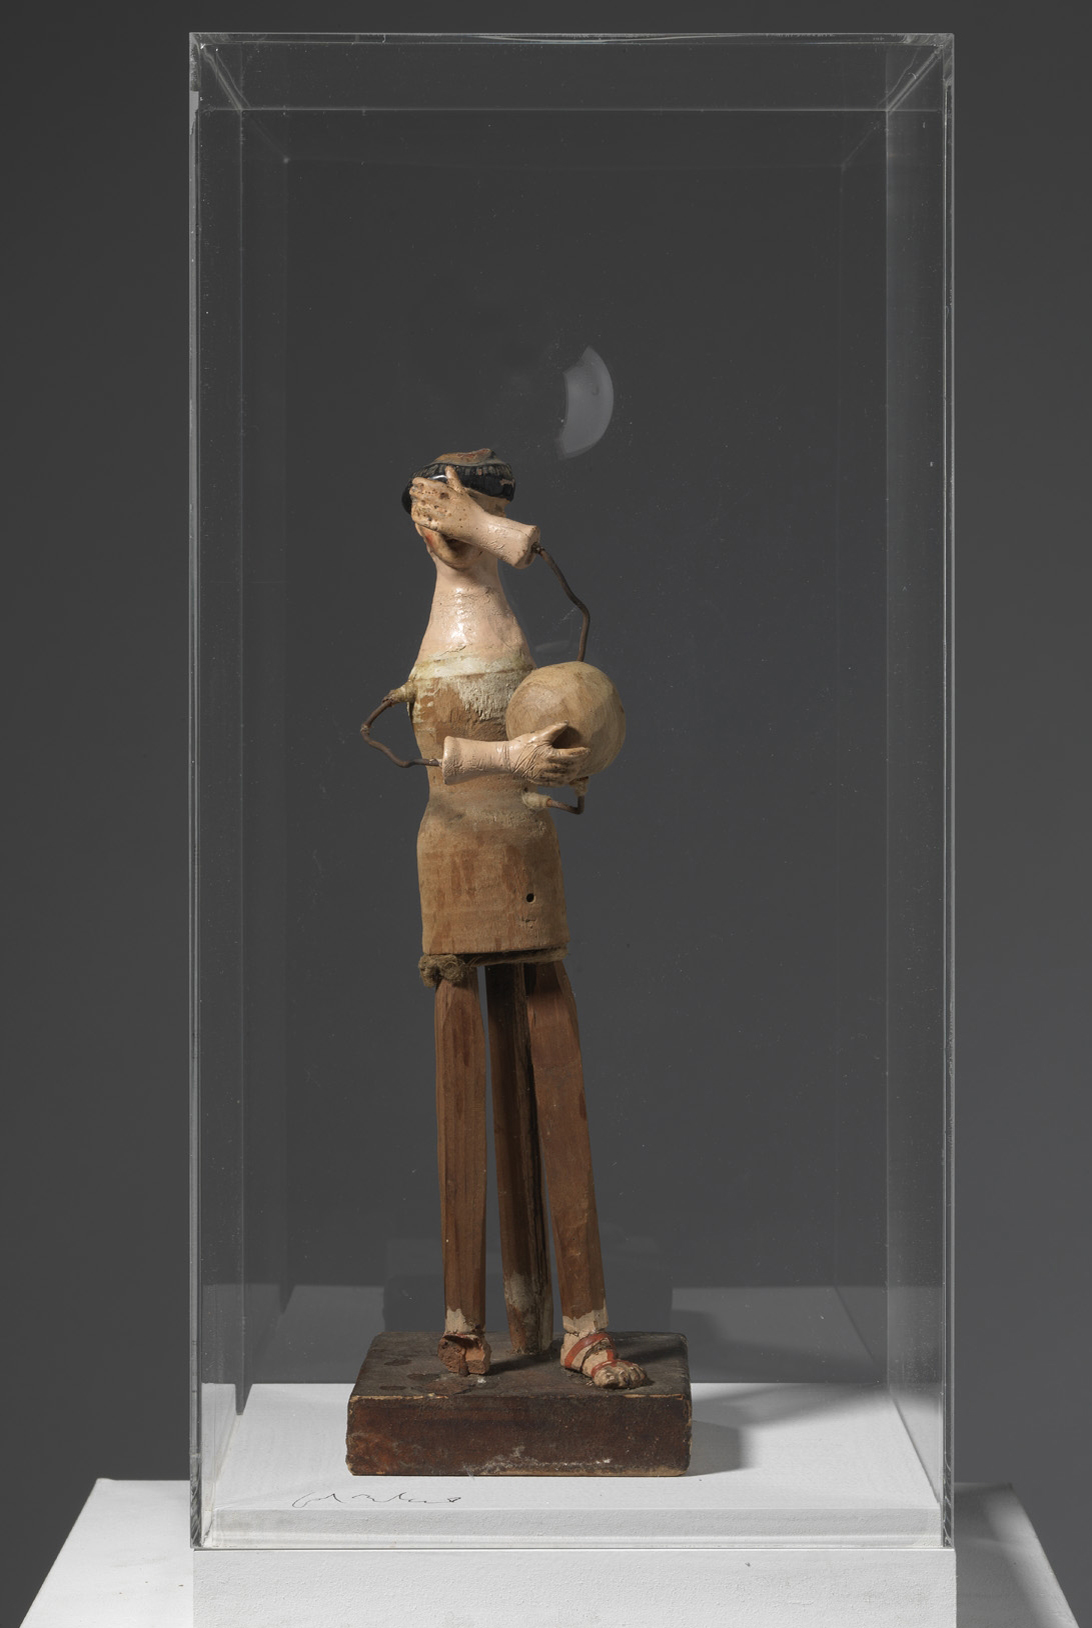 Jordi Alcaraz, Autoretrat com a escultor / Selfportrait as a sculptor, 2011, Skulpturfragmente, Holz, Draht und Methacrylat, 43 x 20 x 20 cm